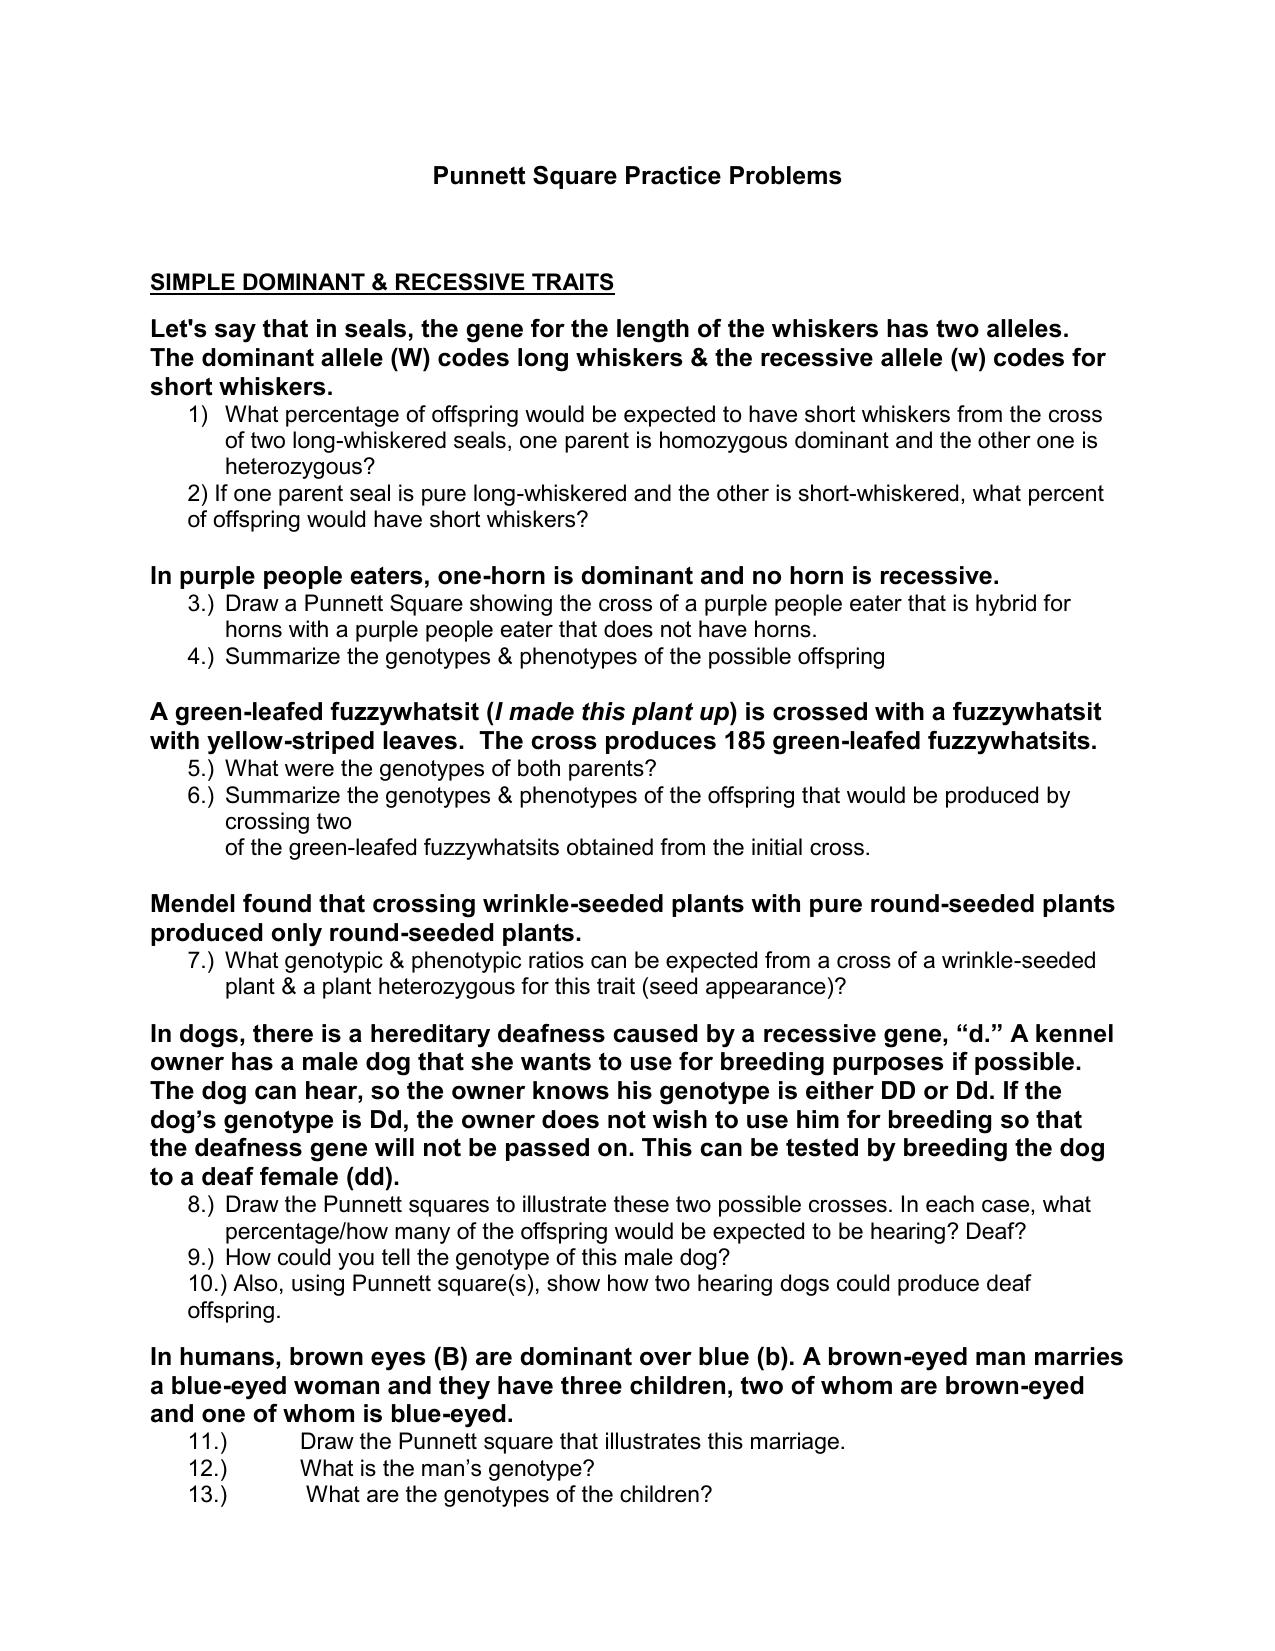 Worksheets Punnett Square Practice Worksheet Answers 009908183 1 0be3c999a9601d5d3ebc826403d6c54e png